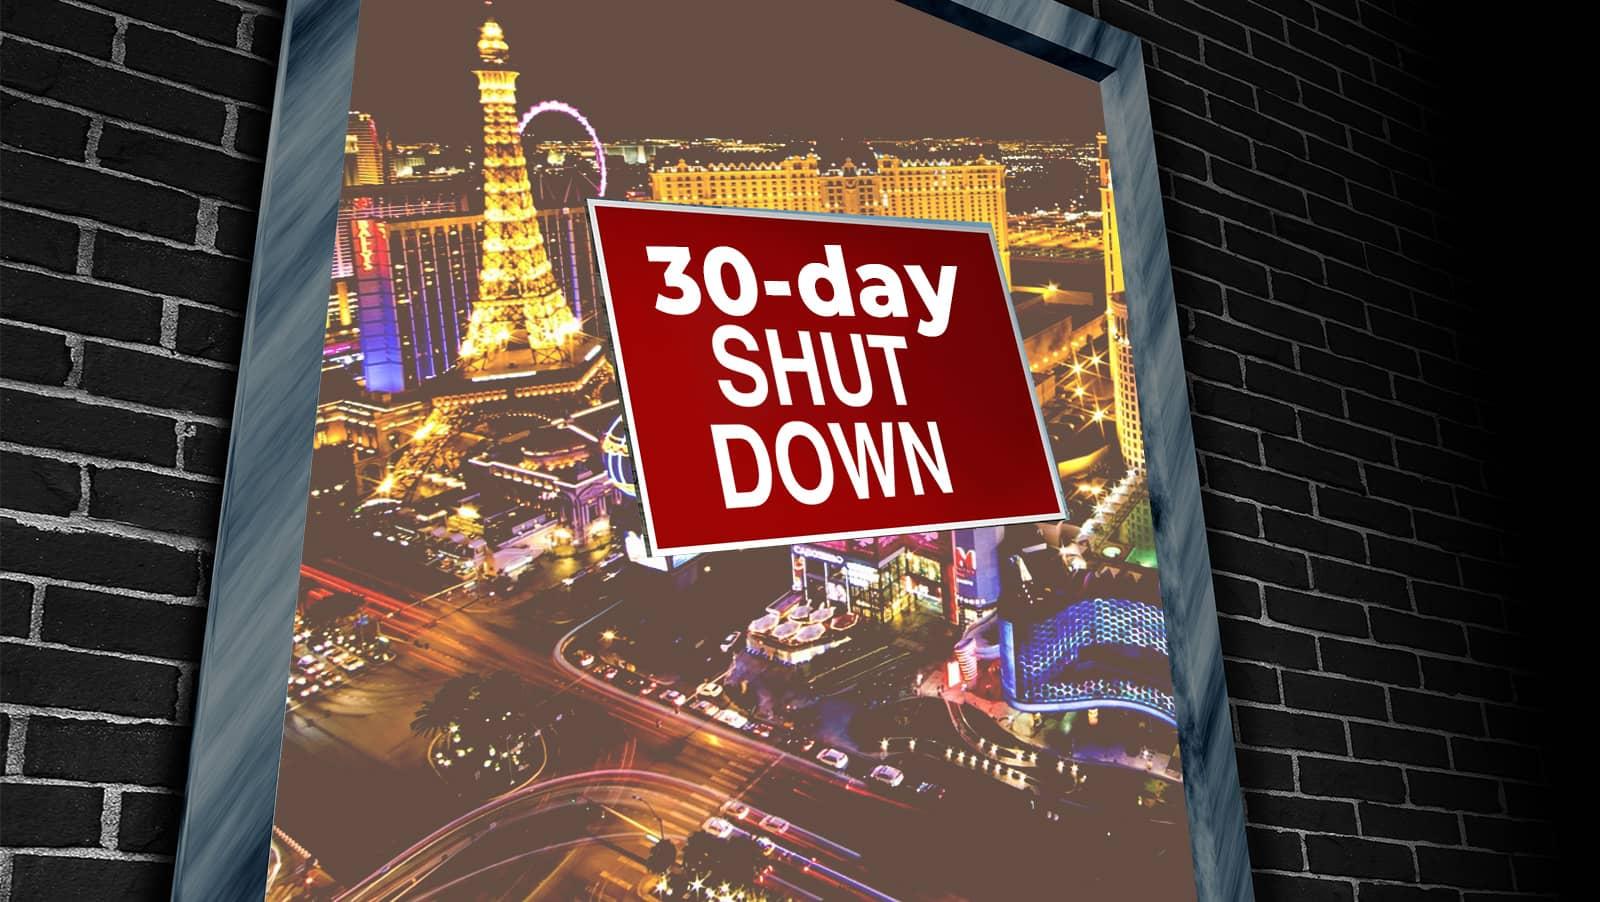 nevada-guv-orders-30-day-shutdown-casinos_feat2-min